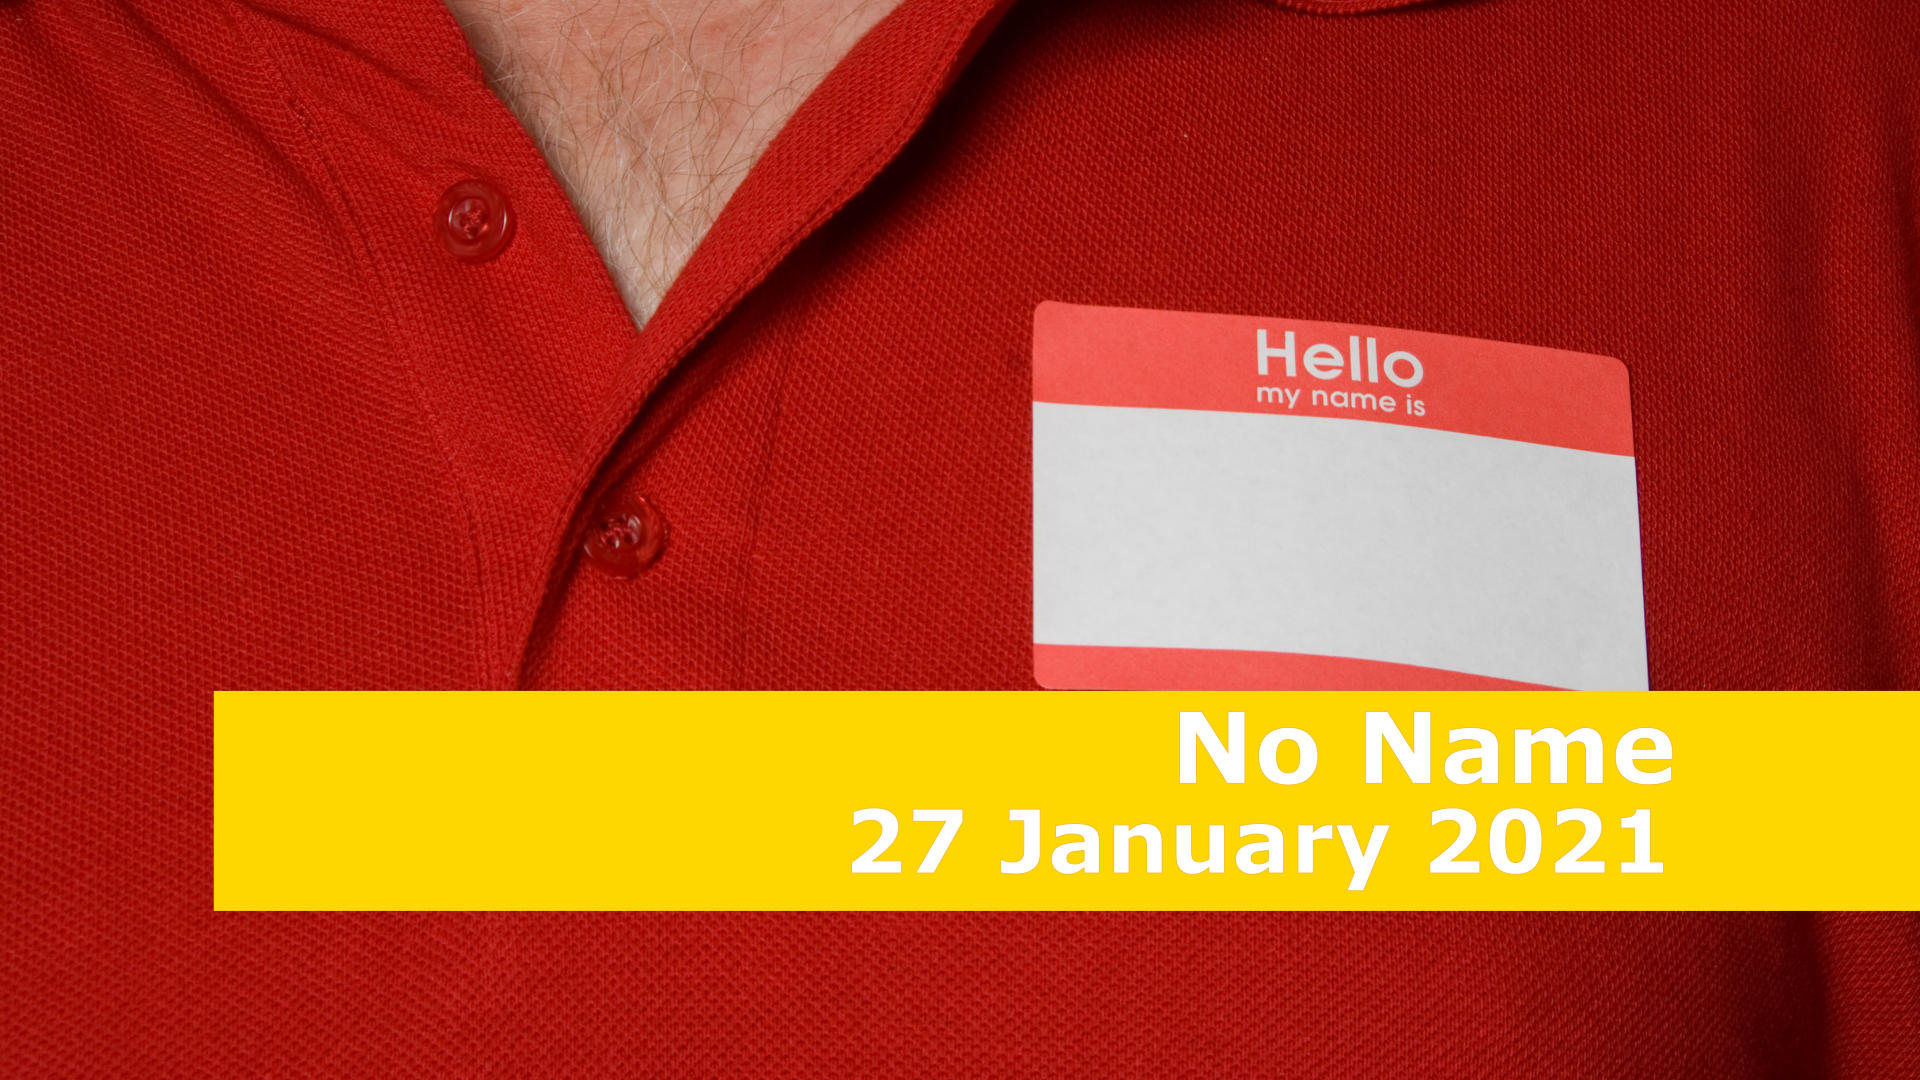 <span class='p-name'>No Name — 27 January 2021 Devotional</span>